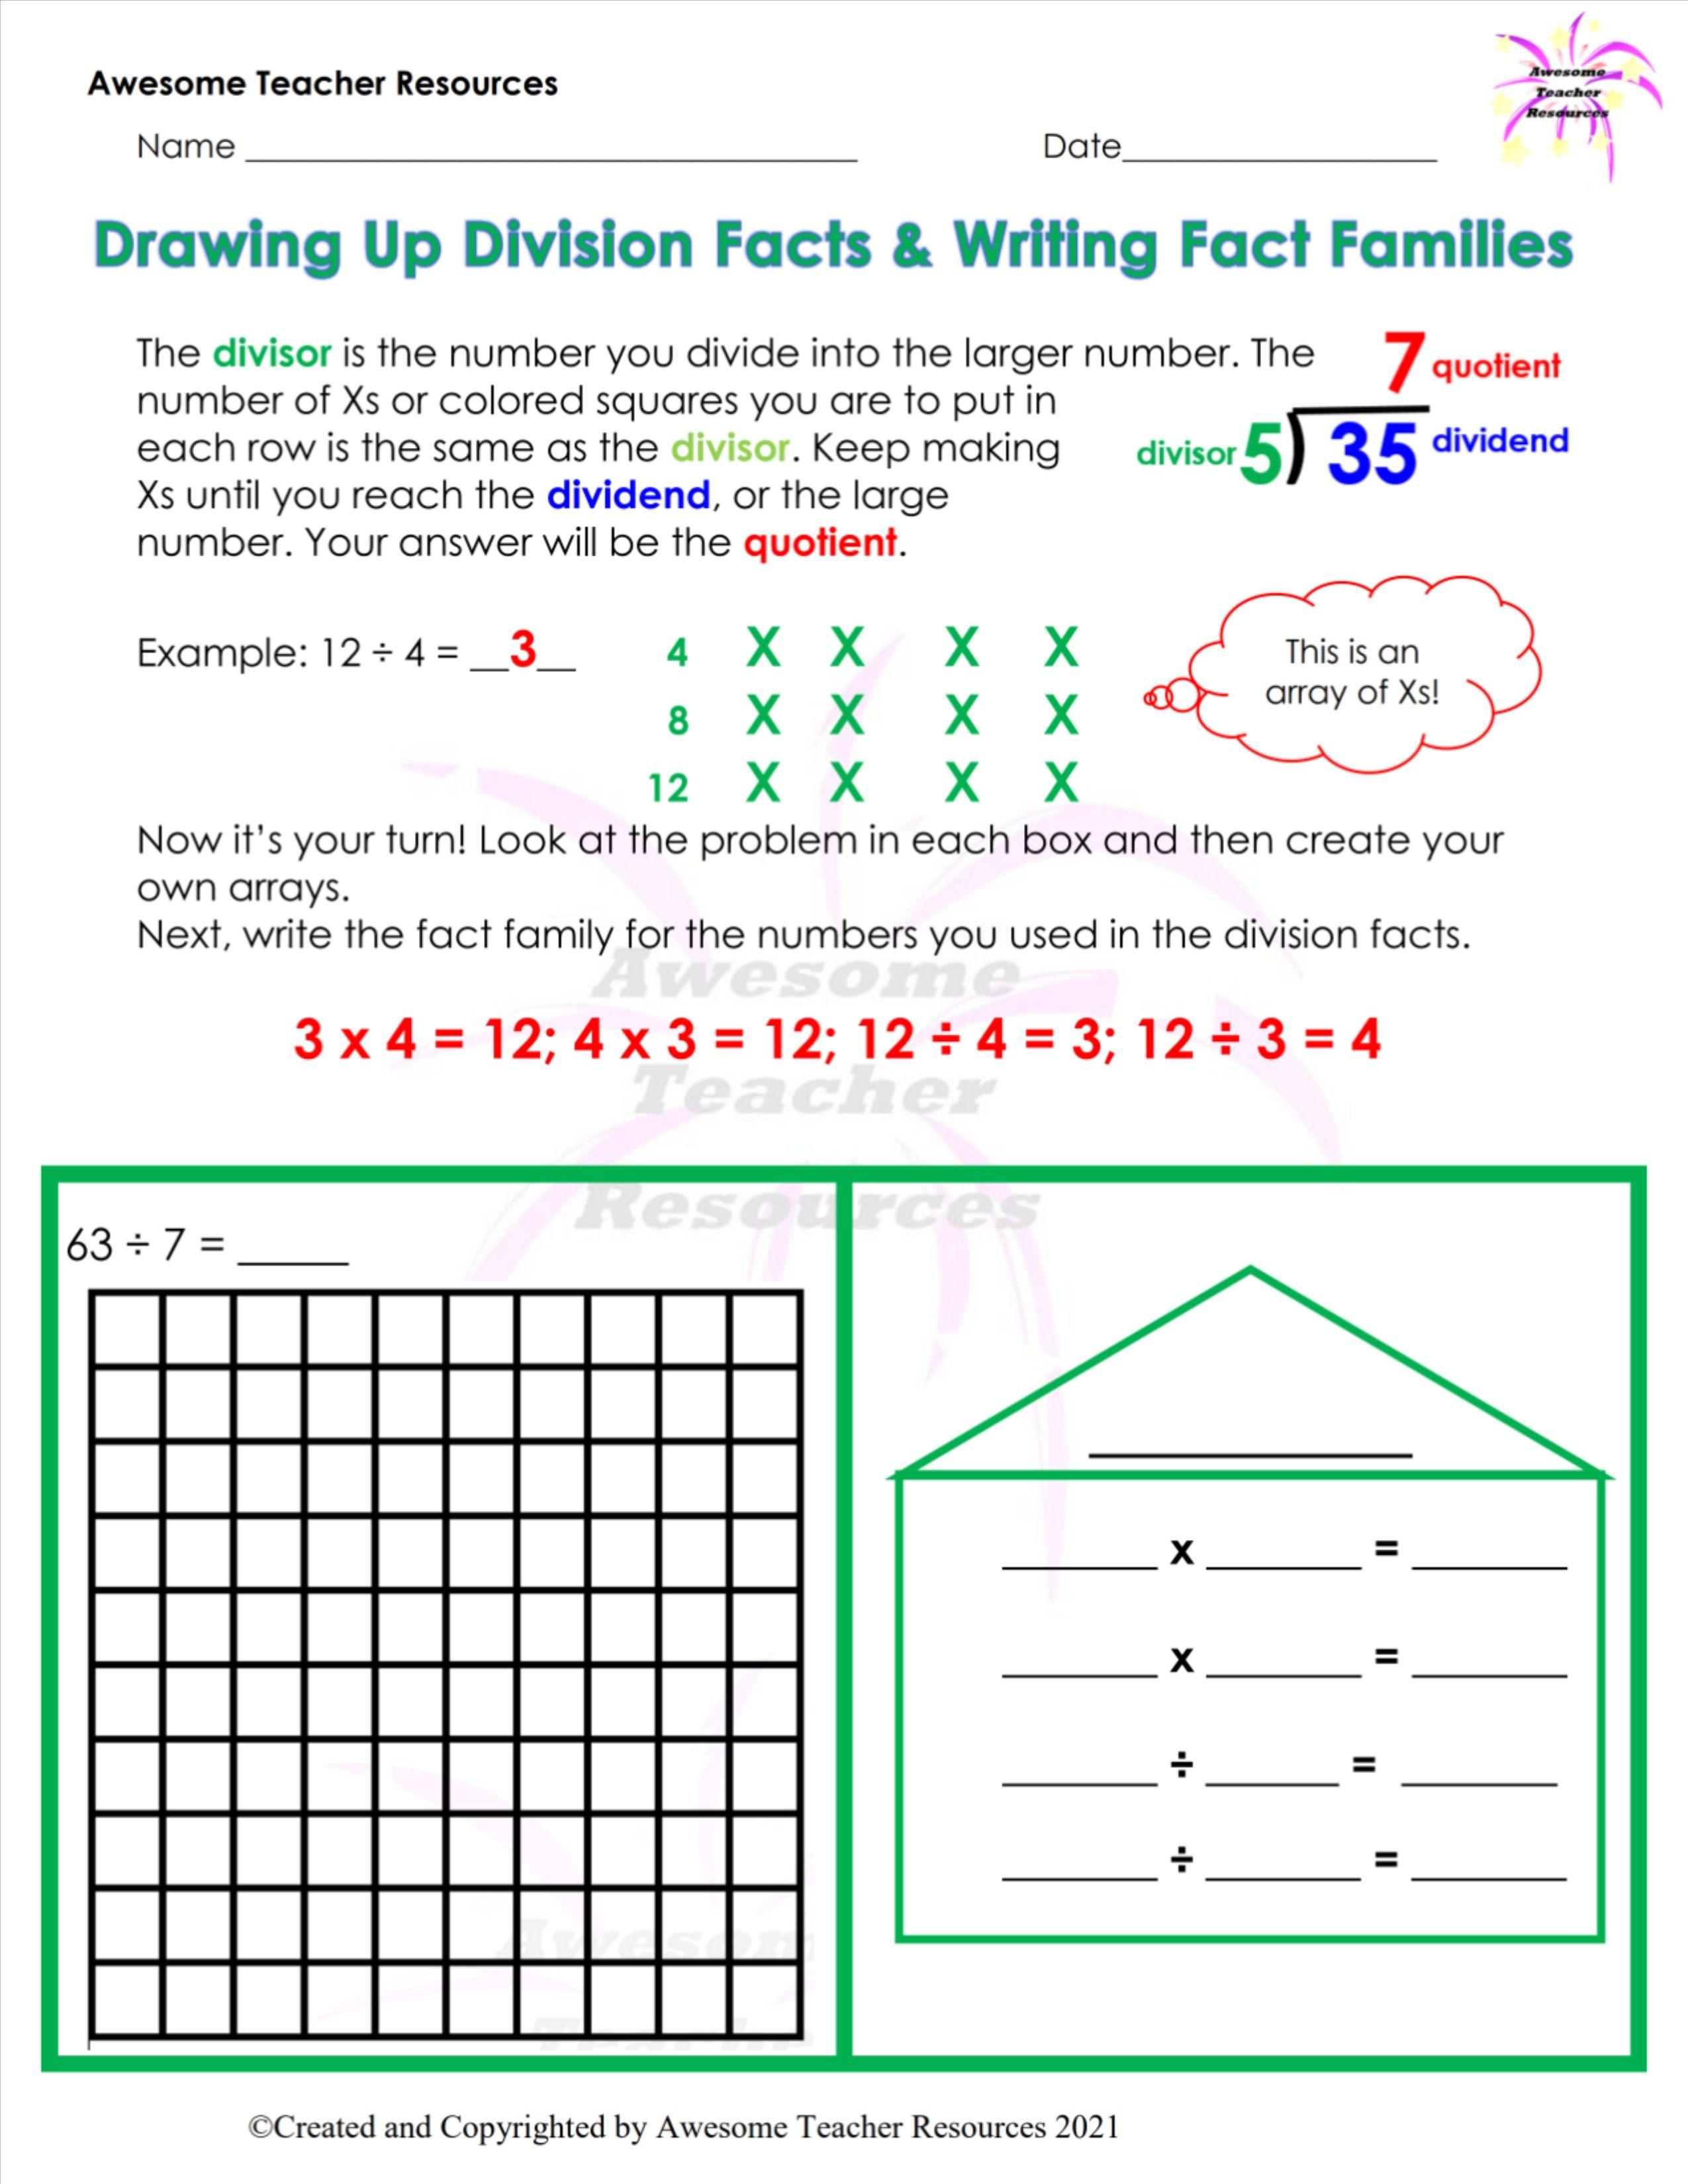 Drawing Up Division Facts Writing Fact Families Worksheet 1 In 2021 Division Facts Fact Families Fact Family Worksheet